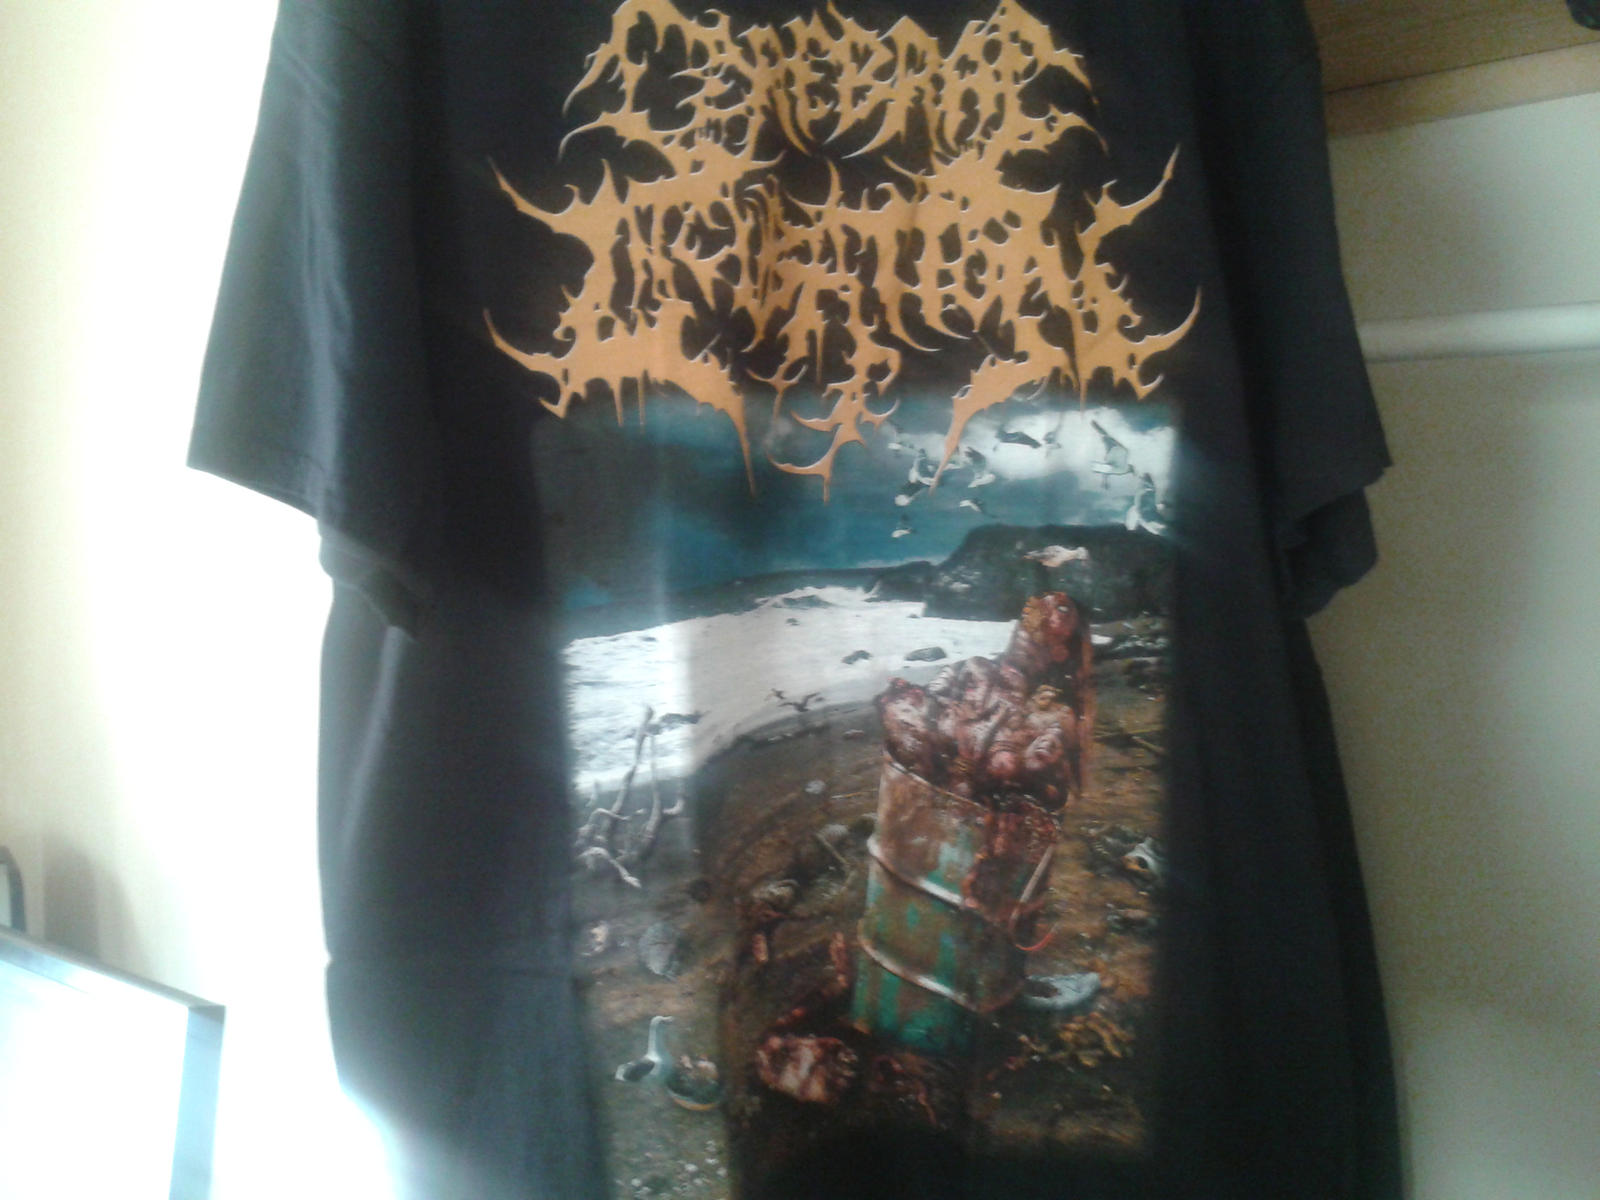 Cerebral Incubation t-shirt